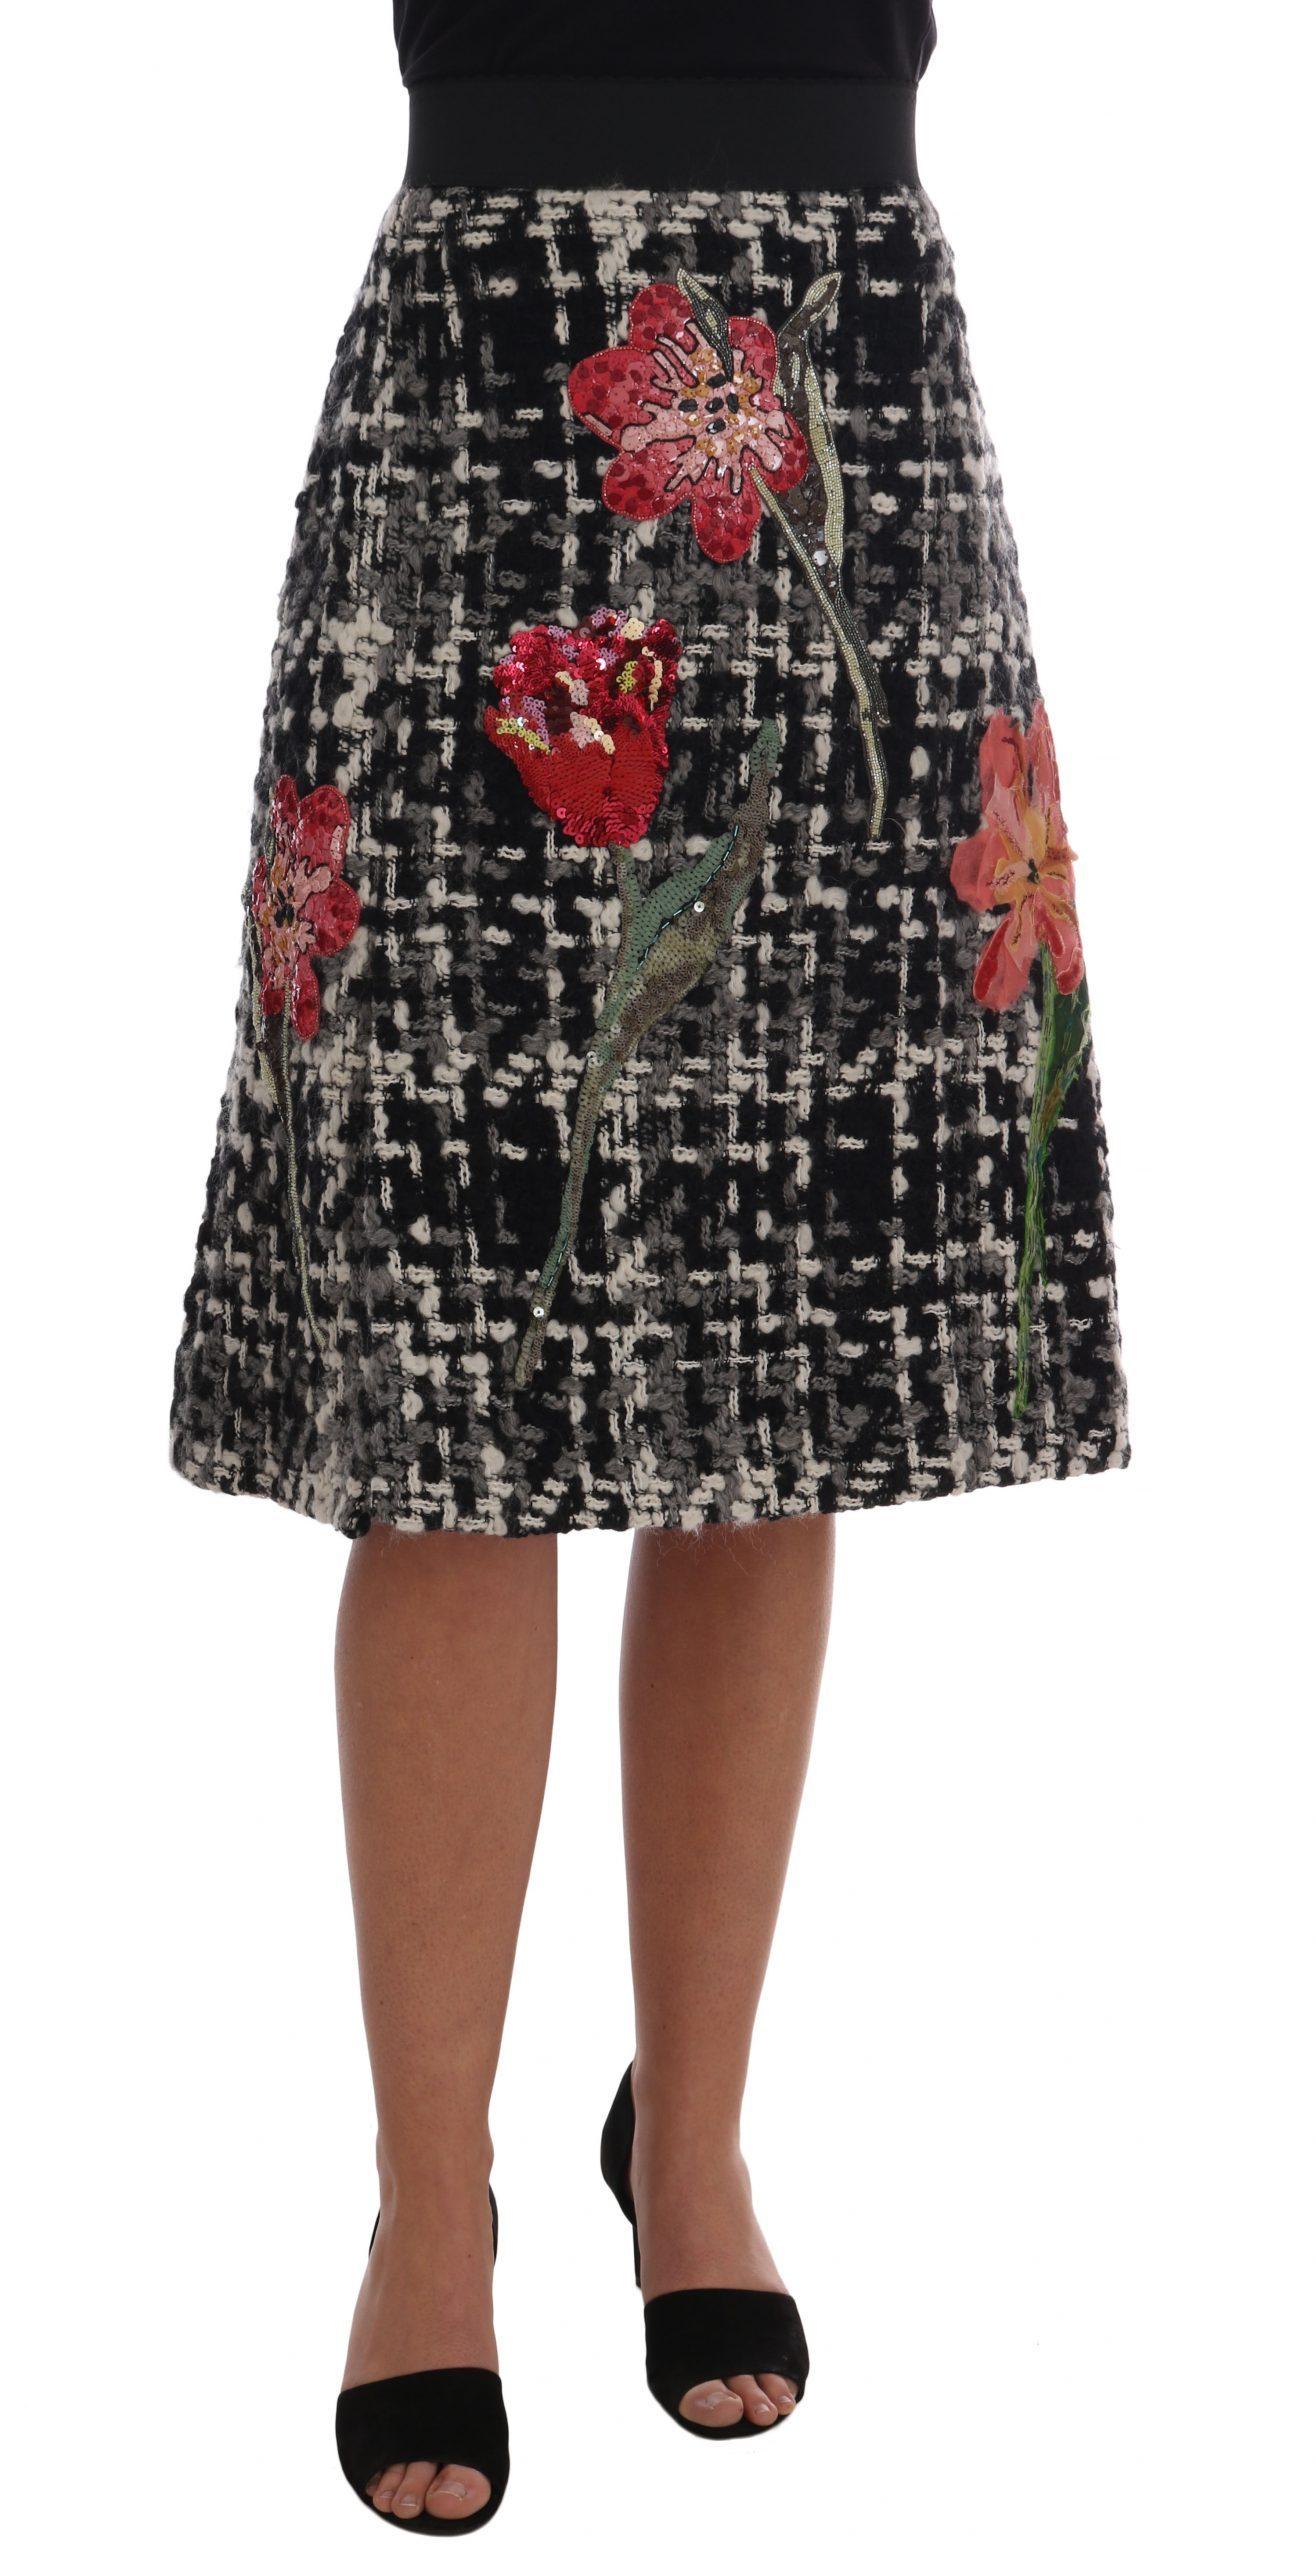 Dolce & Gabbana Women's Wool Sequined Roses Skirt Black SKI1129 - IT46 XL